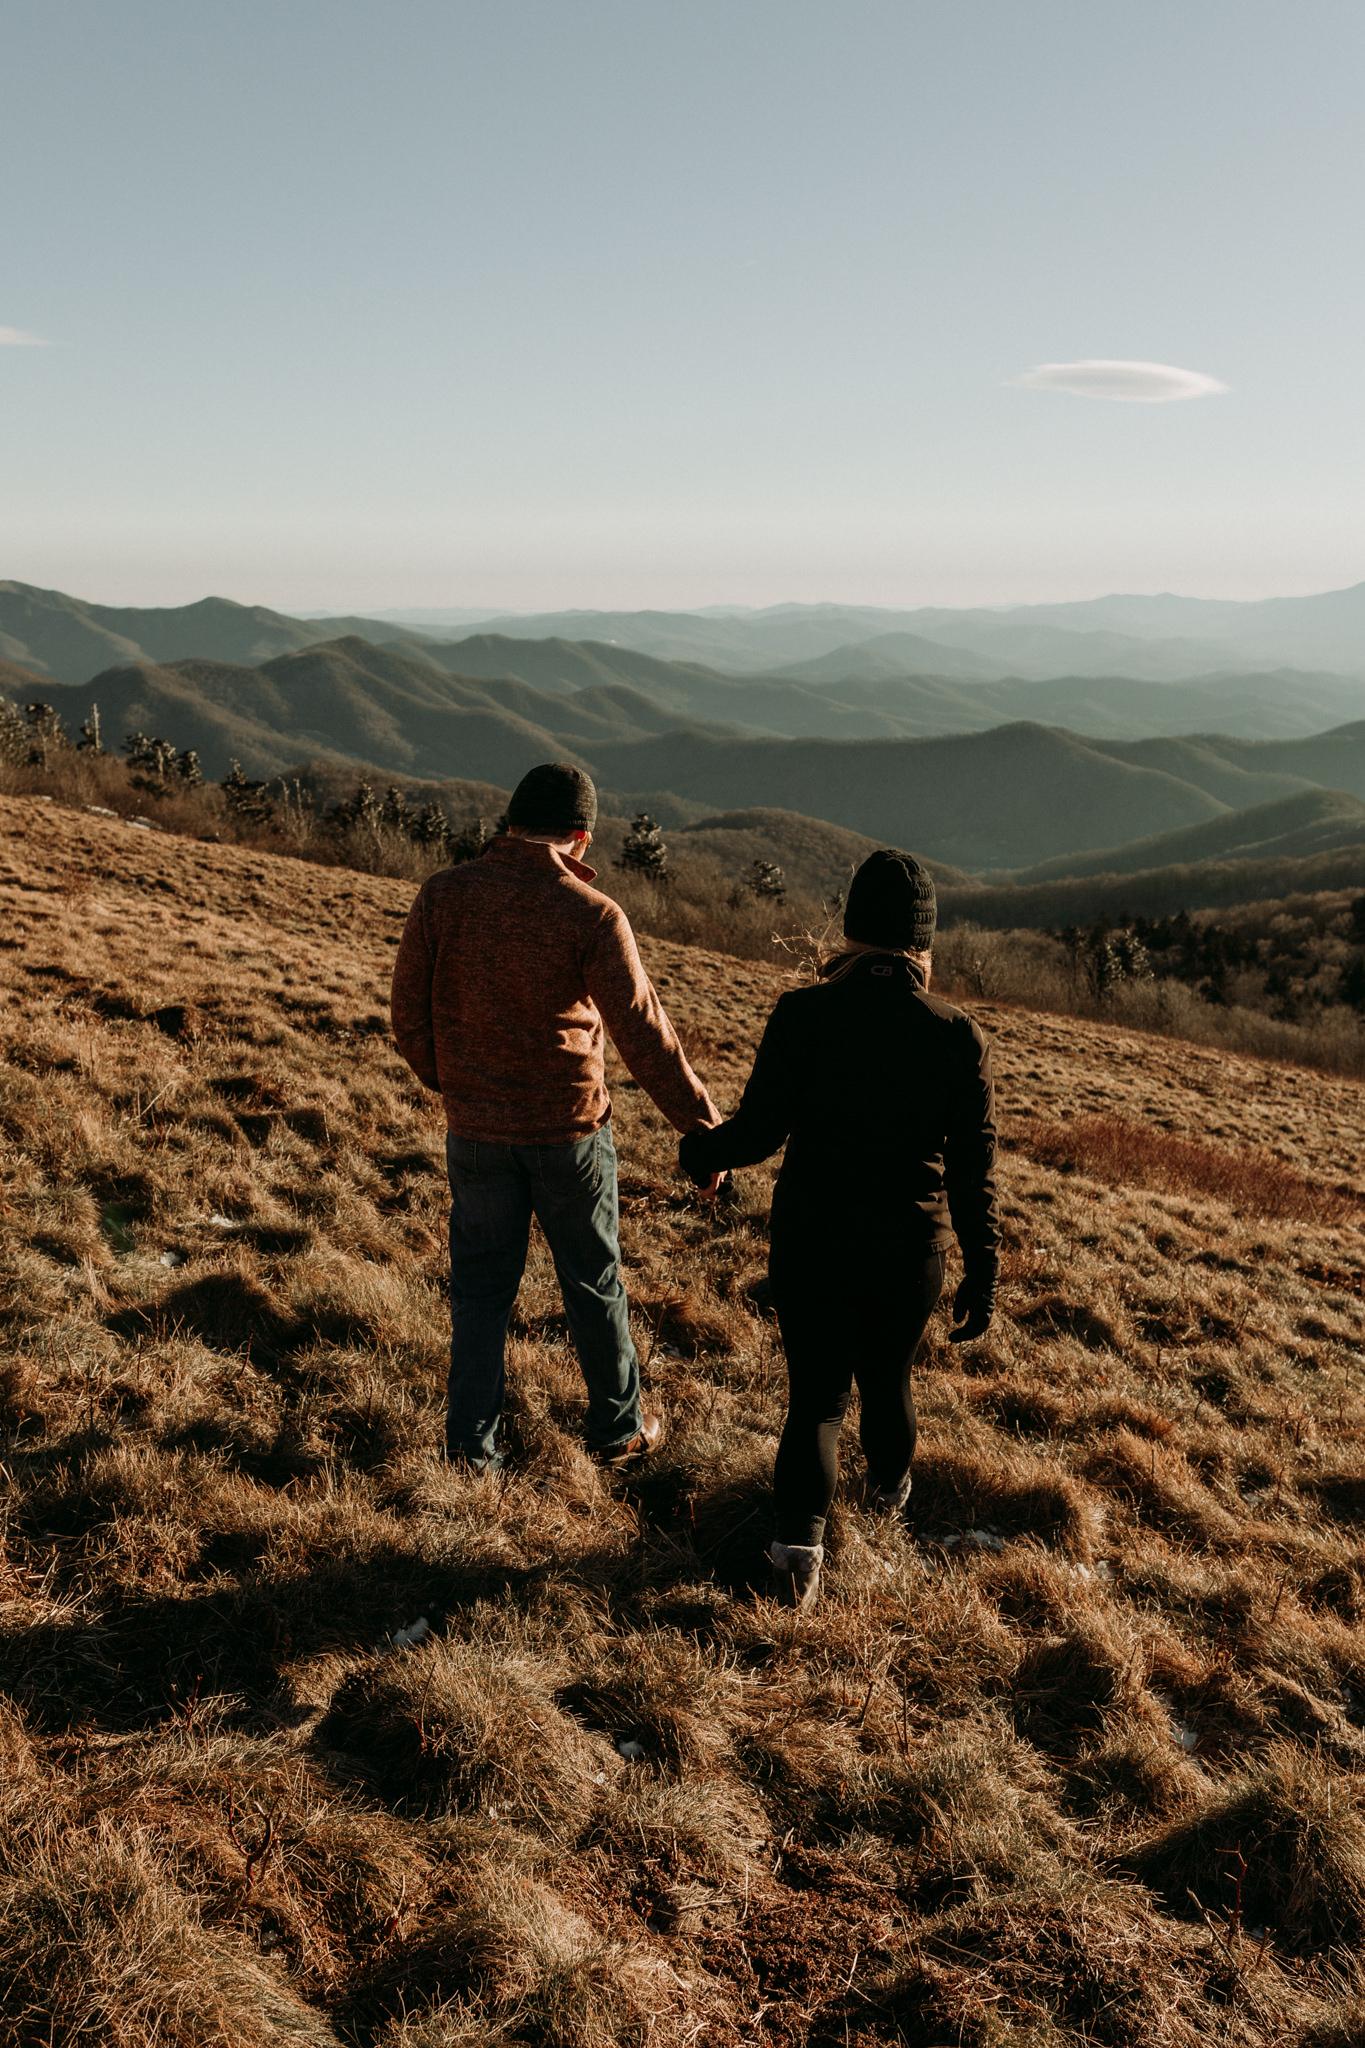 MonicaLeavellPhoto-AshleyMitch-NorthCarolina-Adventure-Engagement-Photographer-26.jpg